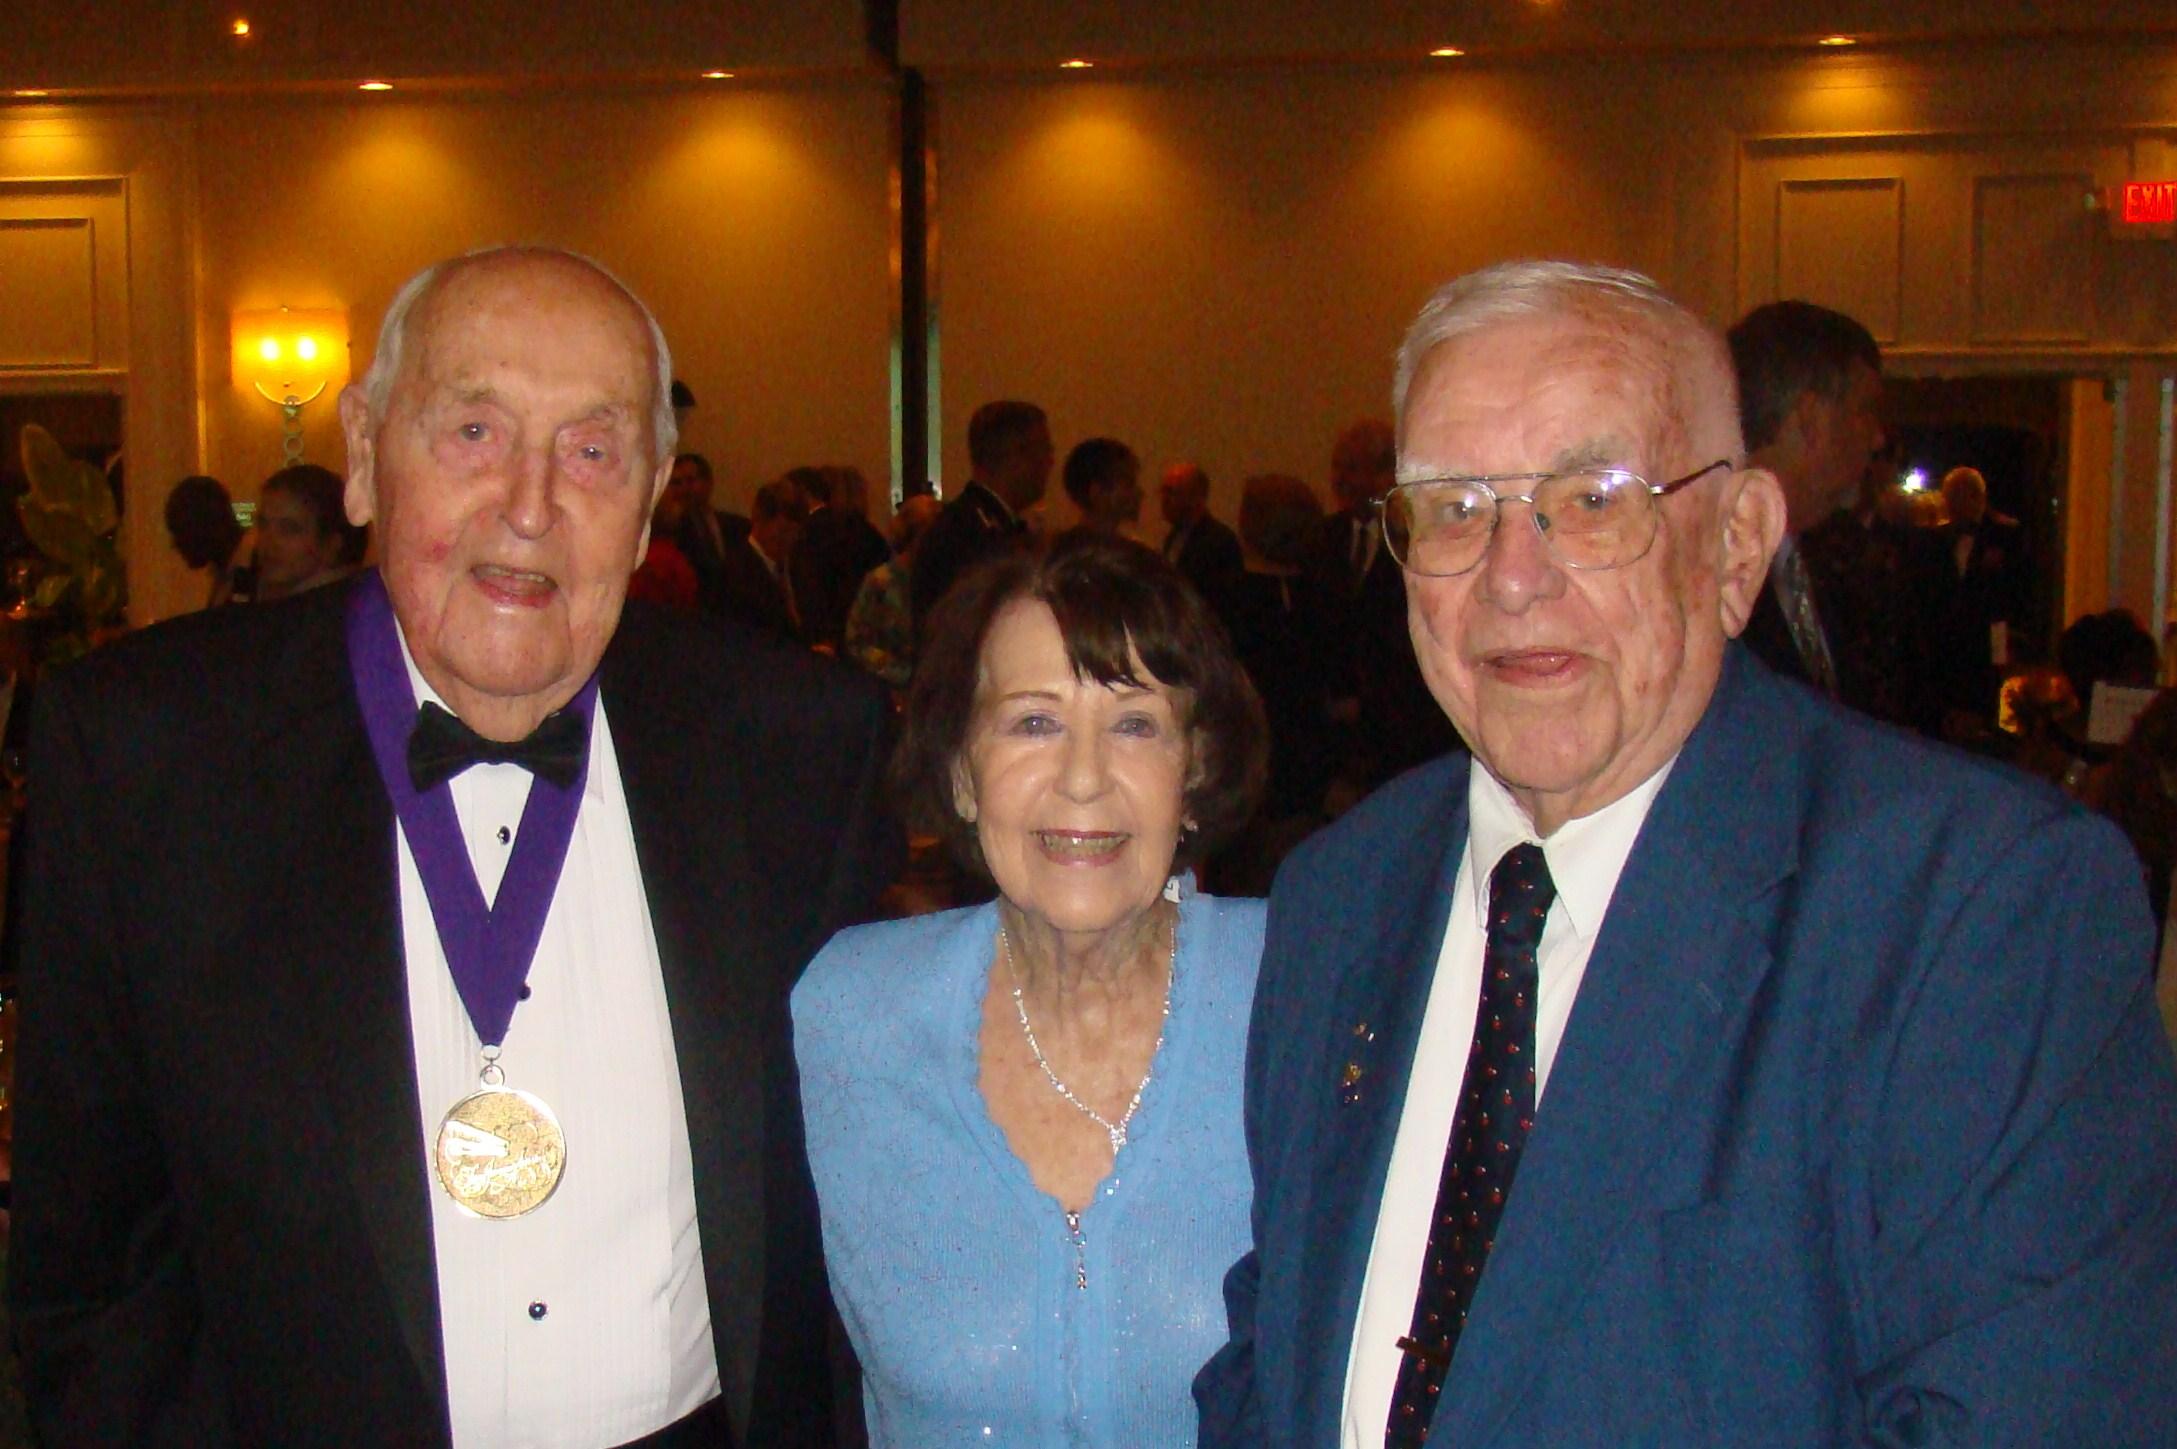 Sir Lenox Hewitt, Ruth Newton & Bob Cutler @ Banquet, 5 Nov '09.JPG